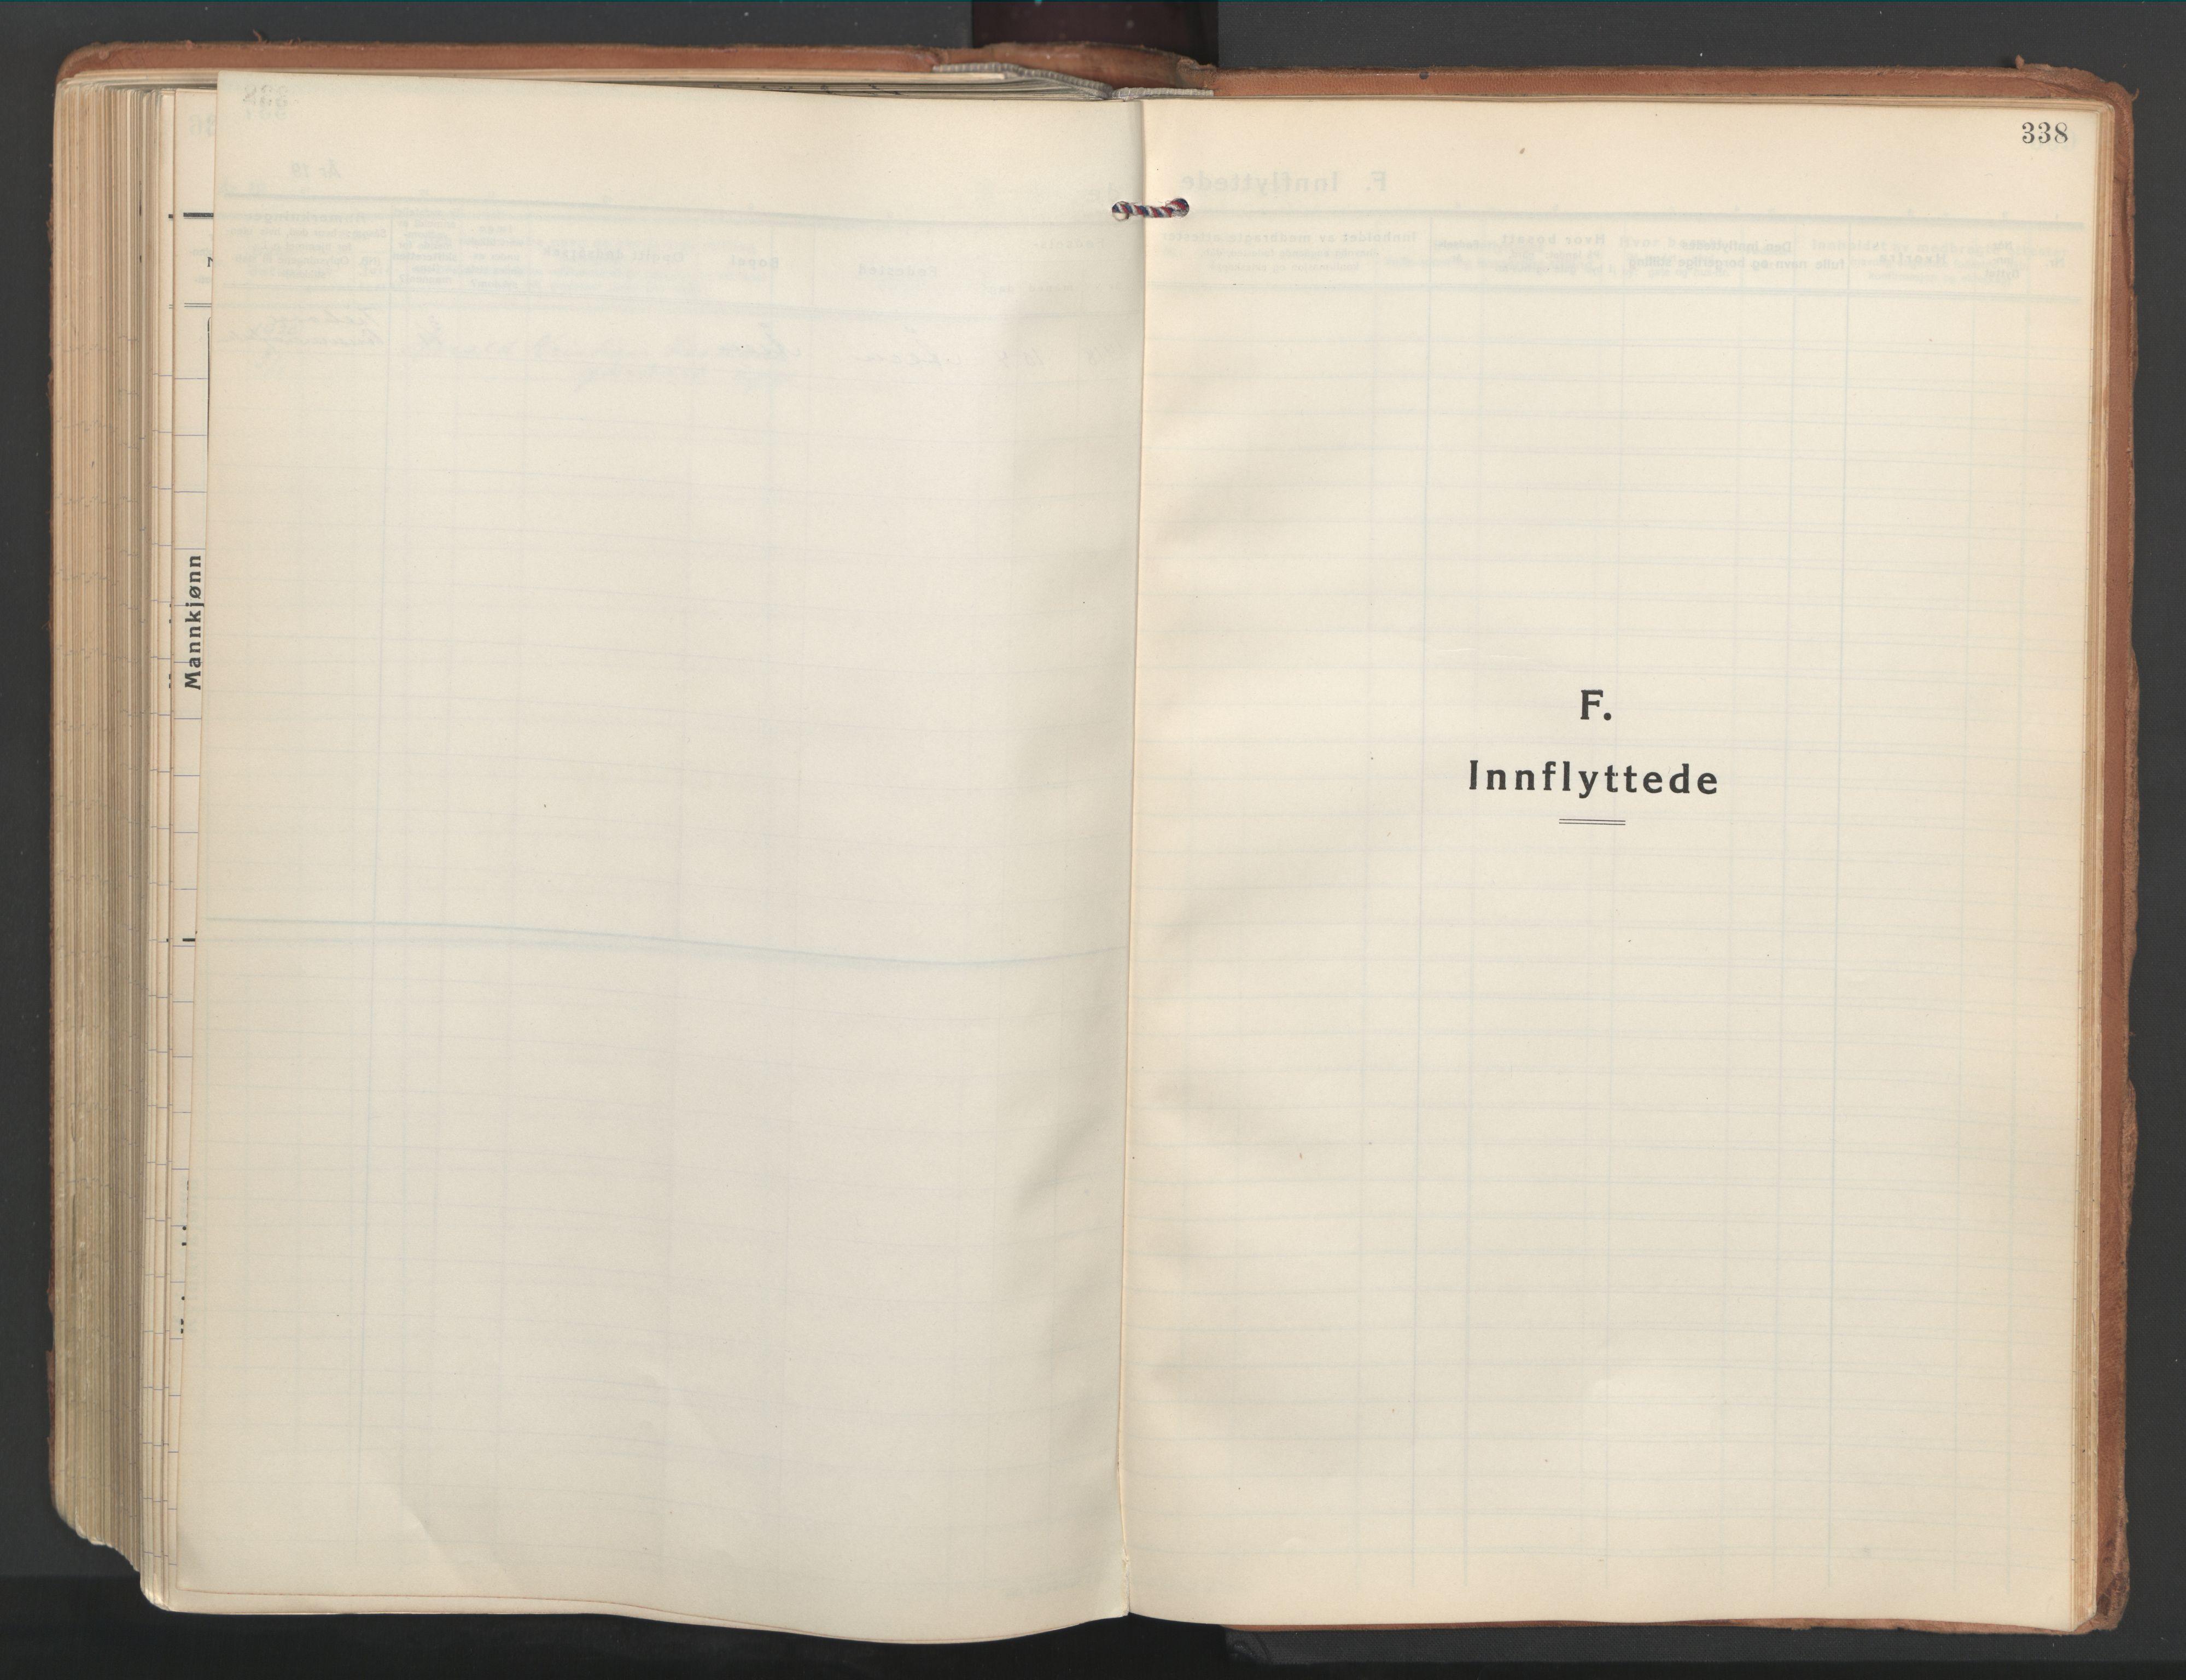 SAT, Ministerialprotokoller, klokkerbøker og fødselsregistre - Nordland, 802/L0061: Ministerialbok nr. 802A08, 1933-1946, s. 338